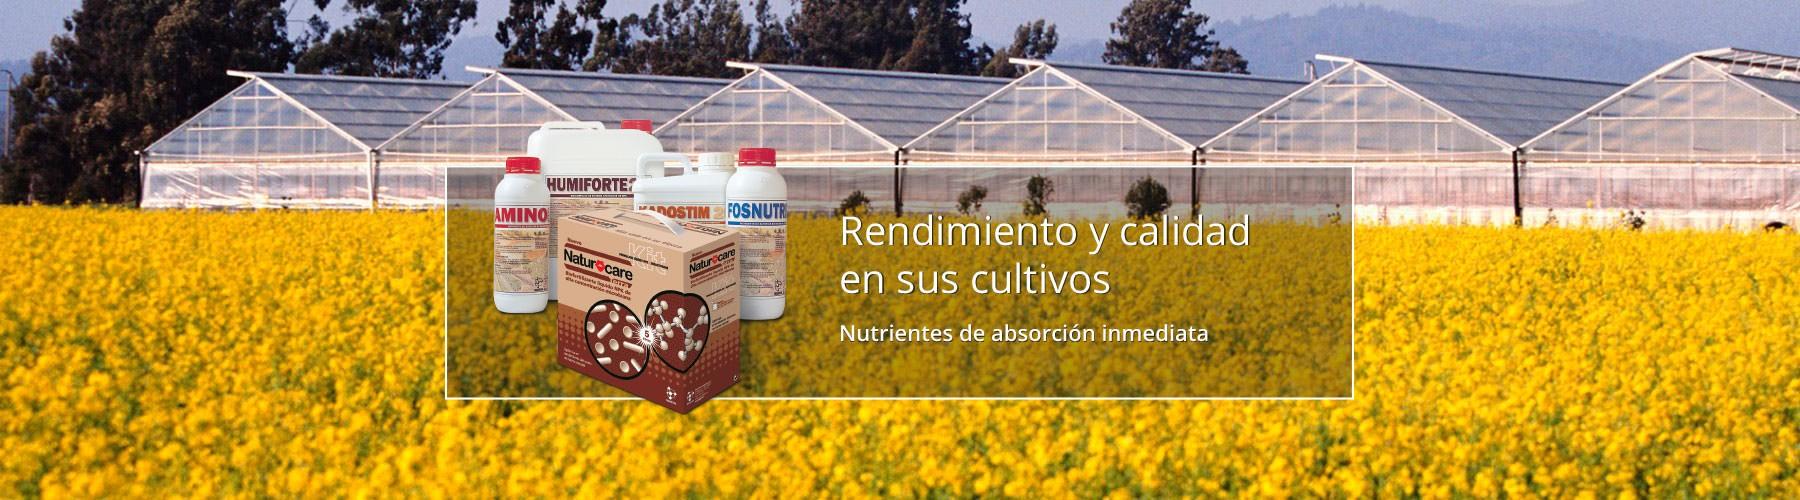 Aminoácidos de absorción inmediata para cultivos